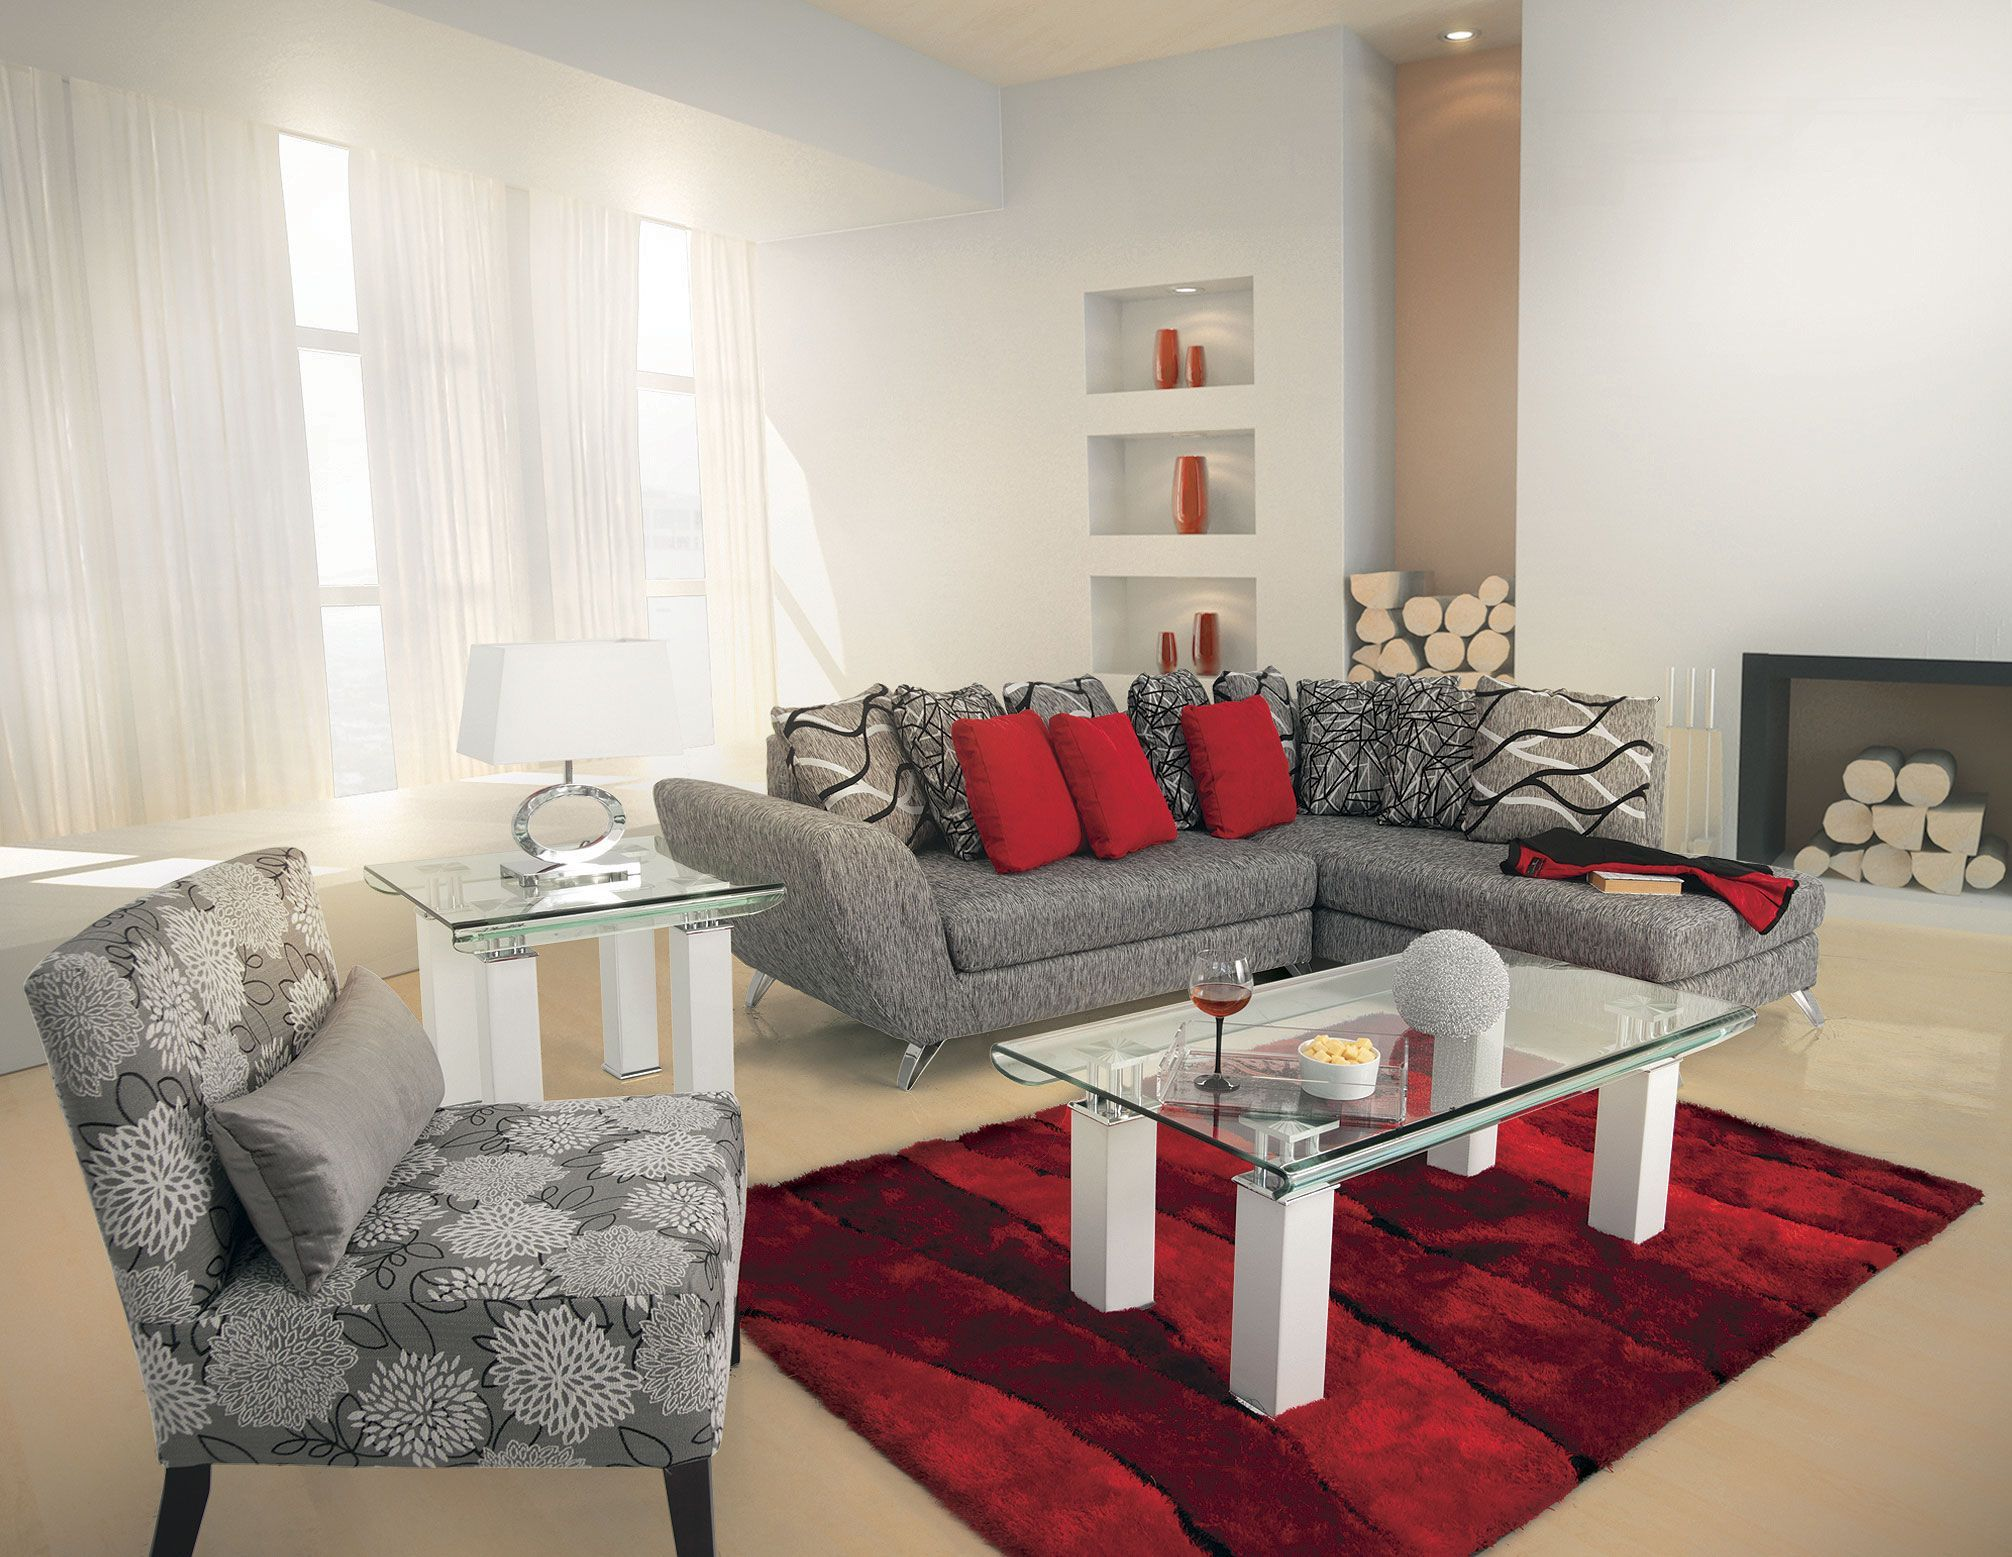 Sala Esquina Greco Malaga De Placencia Muebles Cocinasmodernasgrises Decoracion De Salas Decoracion De Salas Pequeñas Decoracion De Salas Modernas